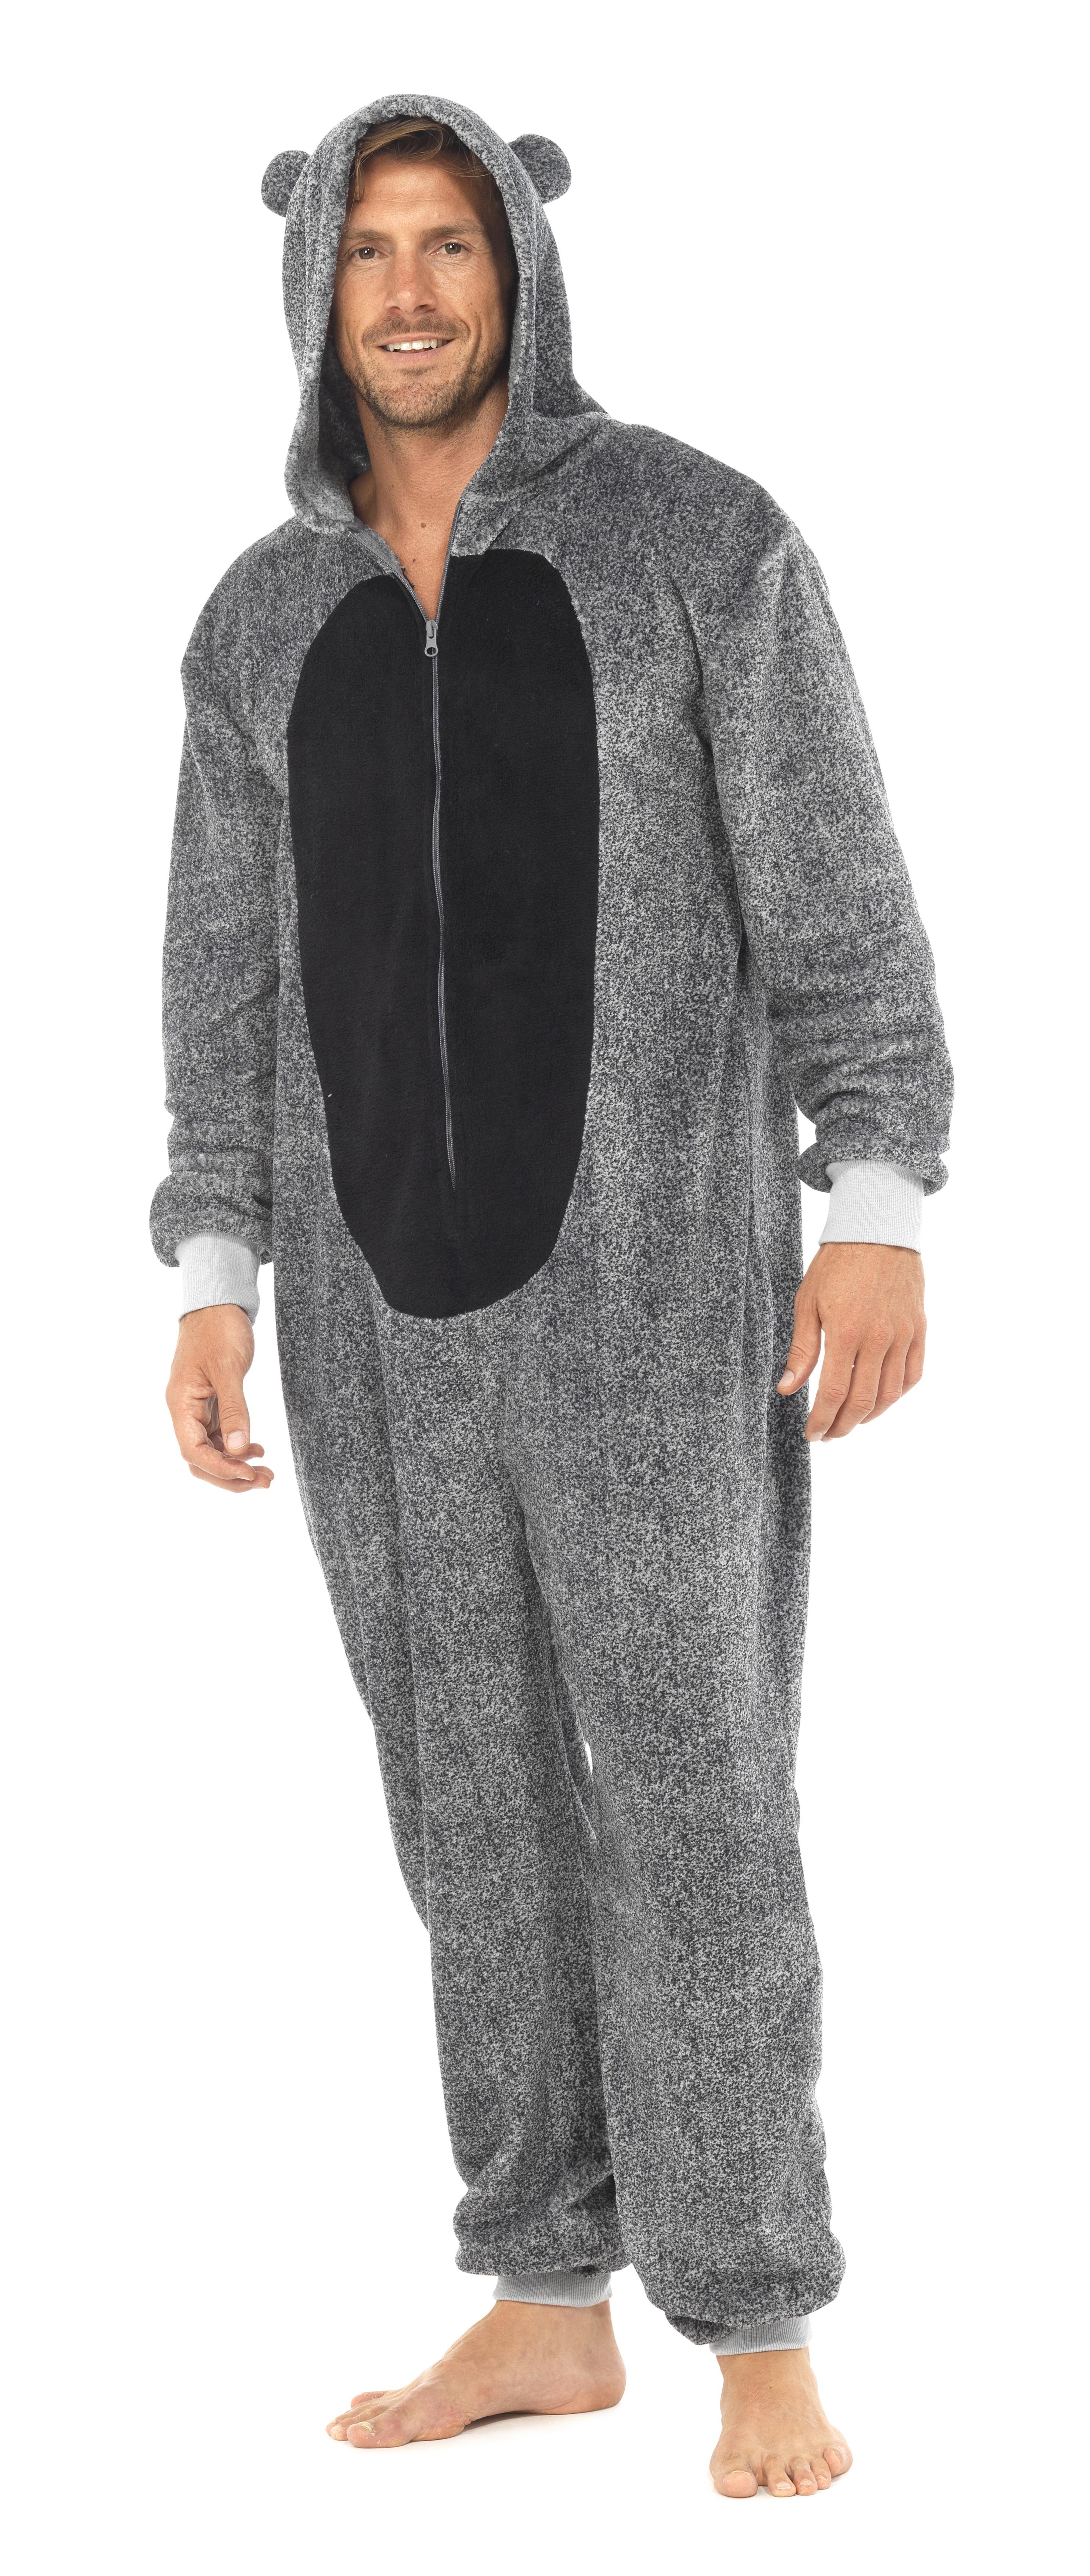 Mens boys fleece hooded animal ears onesie zip all in 1 for Mens dress shirt onesie